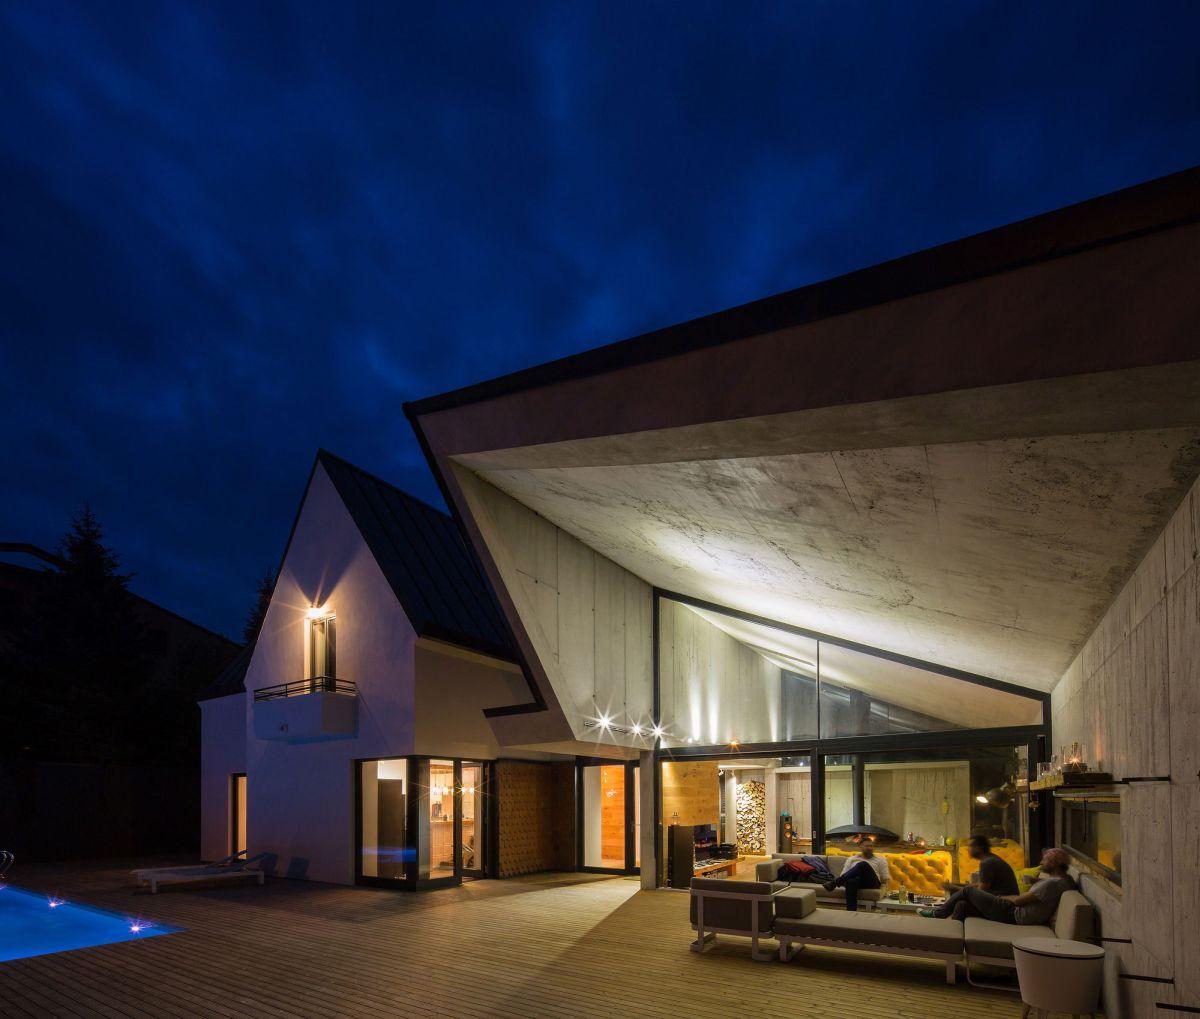 Casa G3 in Otopeni architecture at night